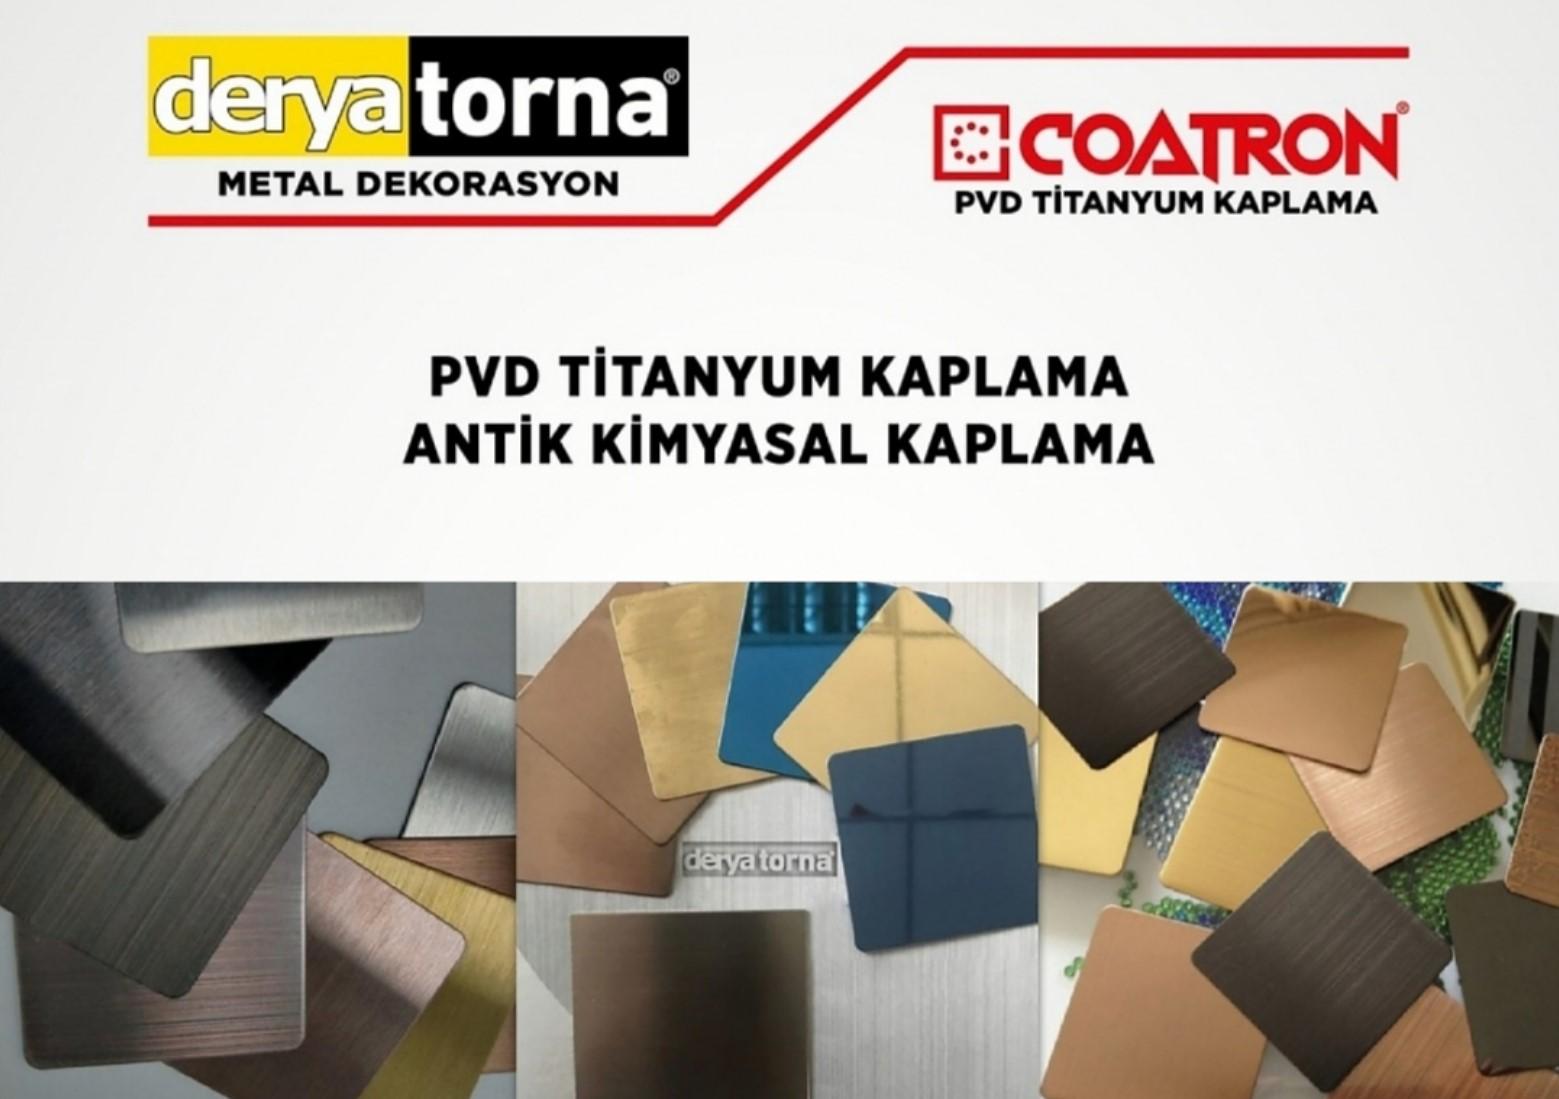 Derya Torna-OSTİM COATRON PVD Titanyum Kaplama